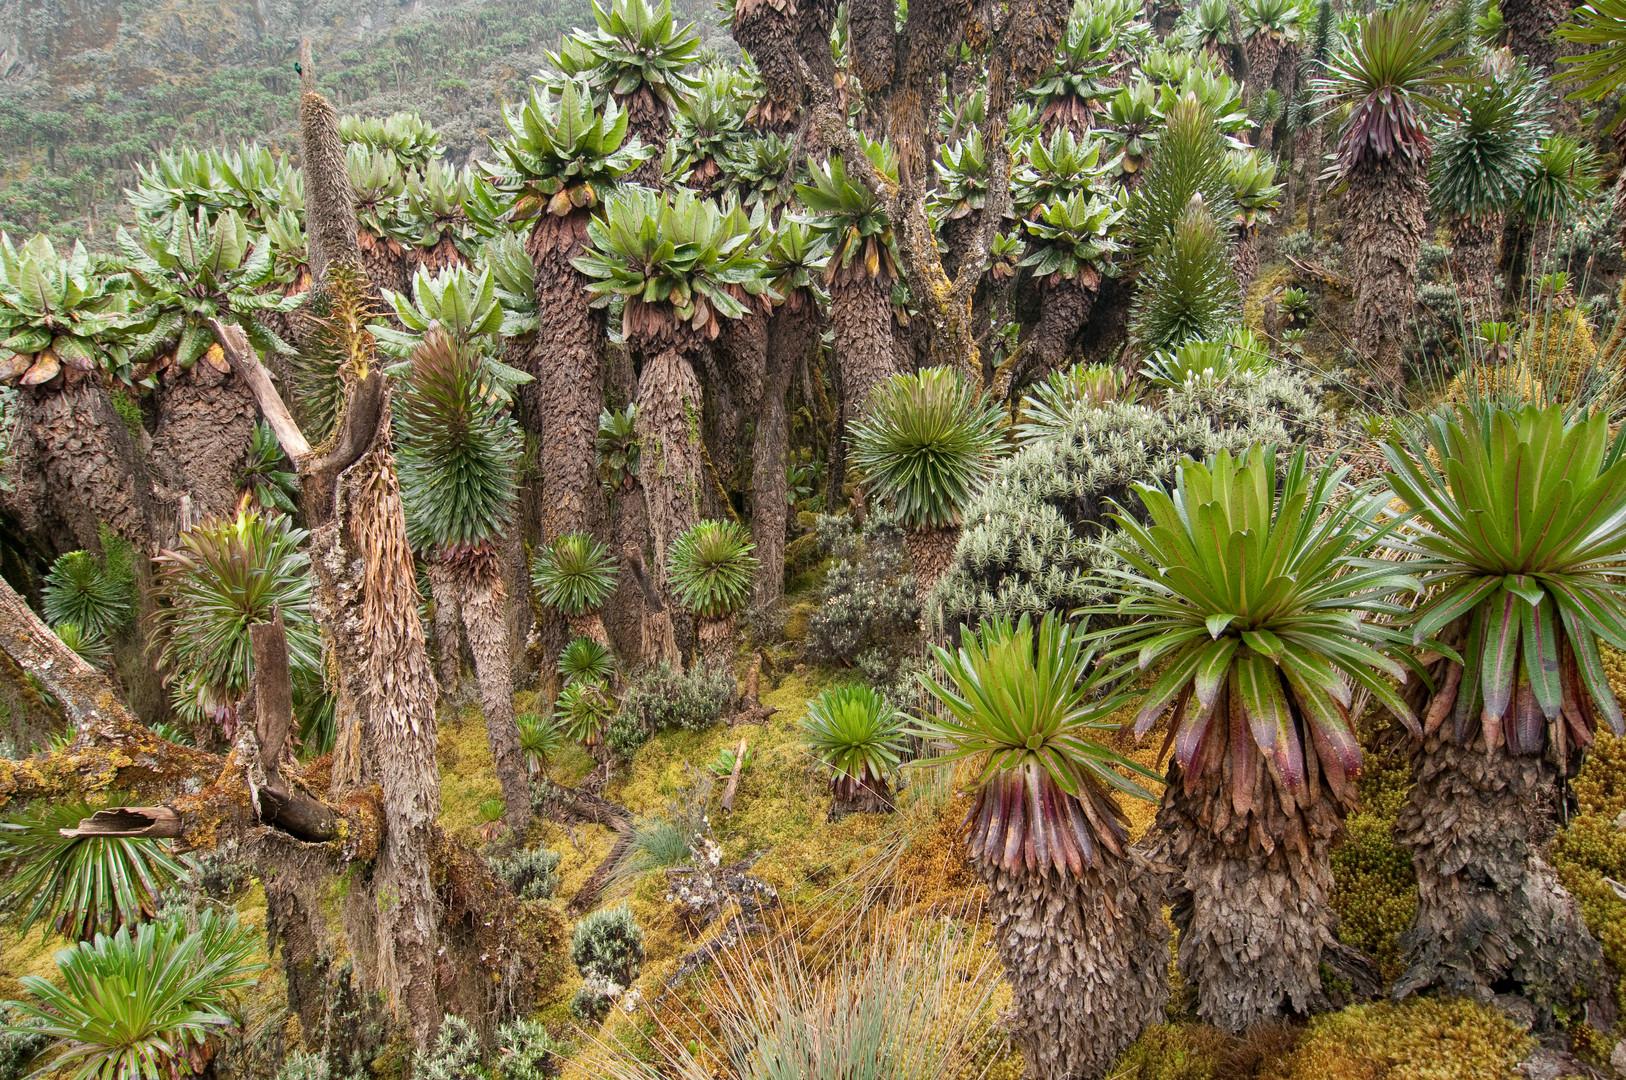 Ruwenzori-Gebirge in Uganda